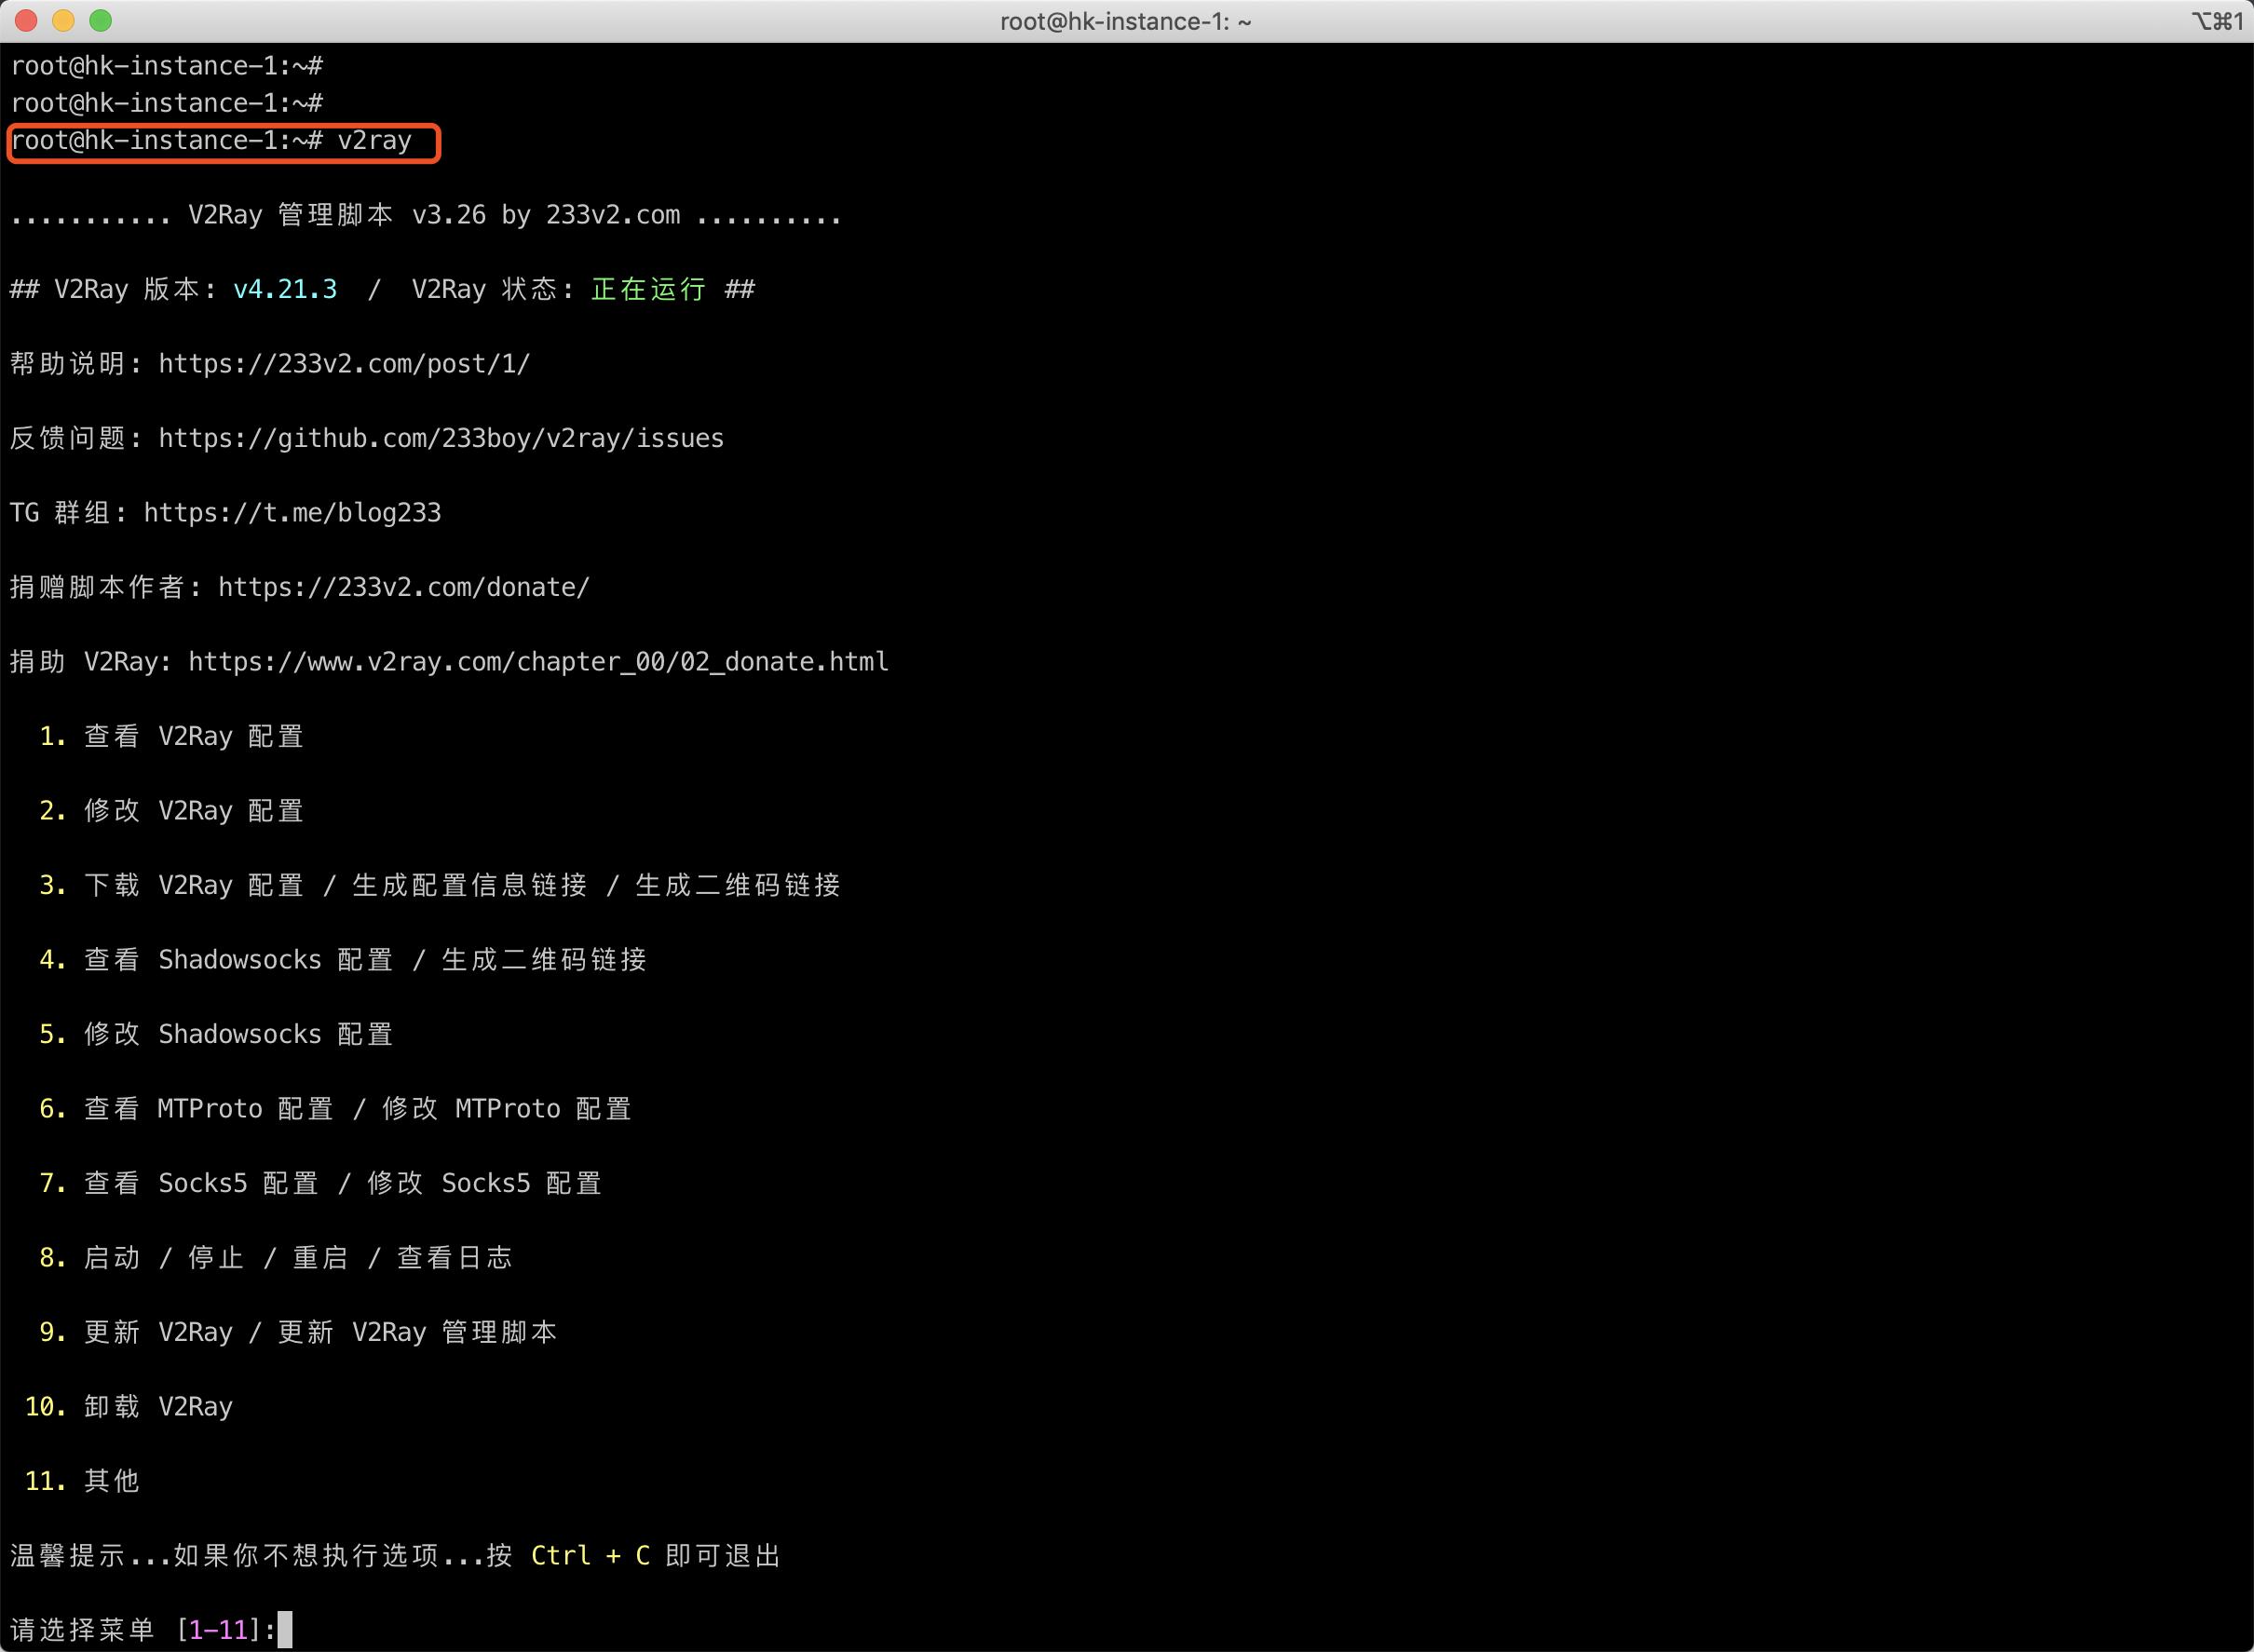 v2ray服务器配置信息.png